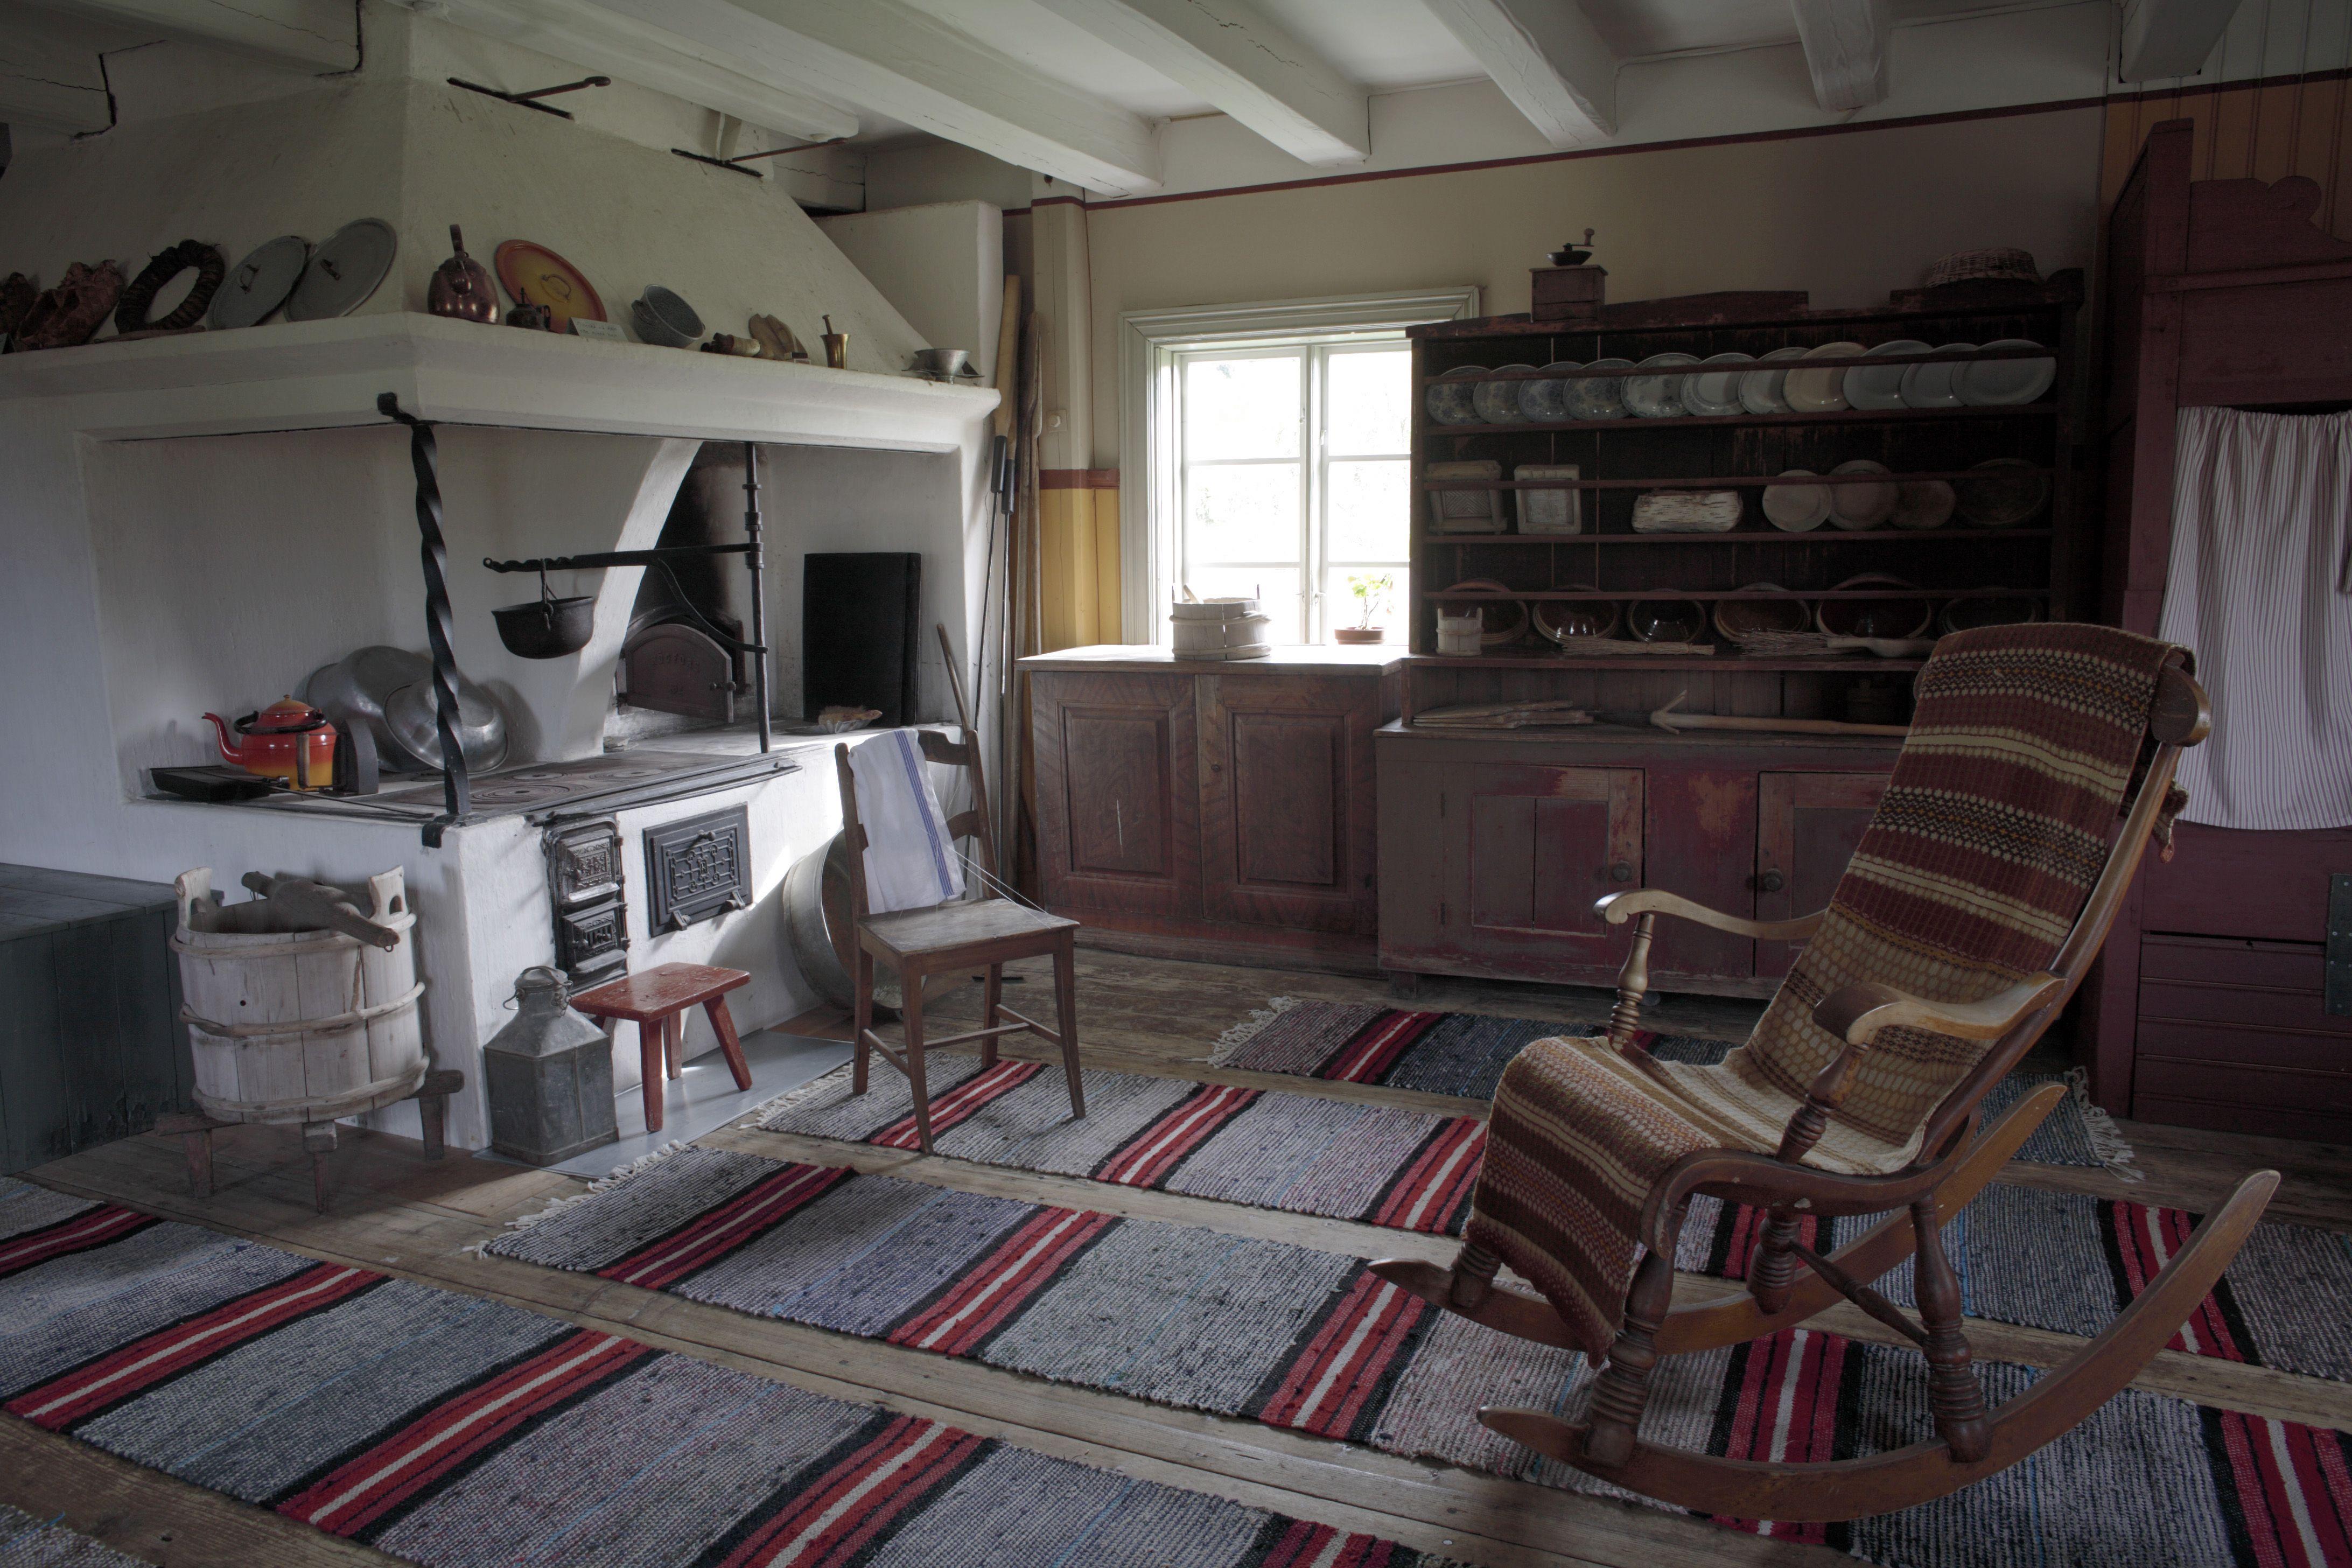 Tupa Farmhouse Looking Like It Did Hundred Years Ago